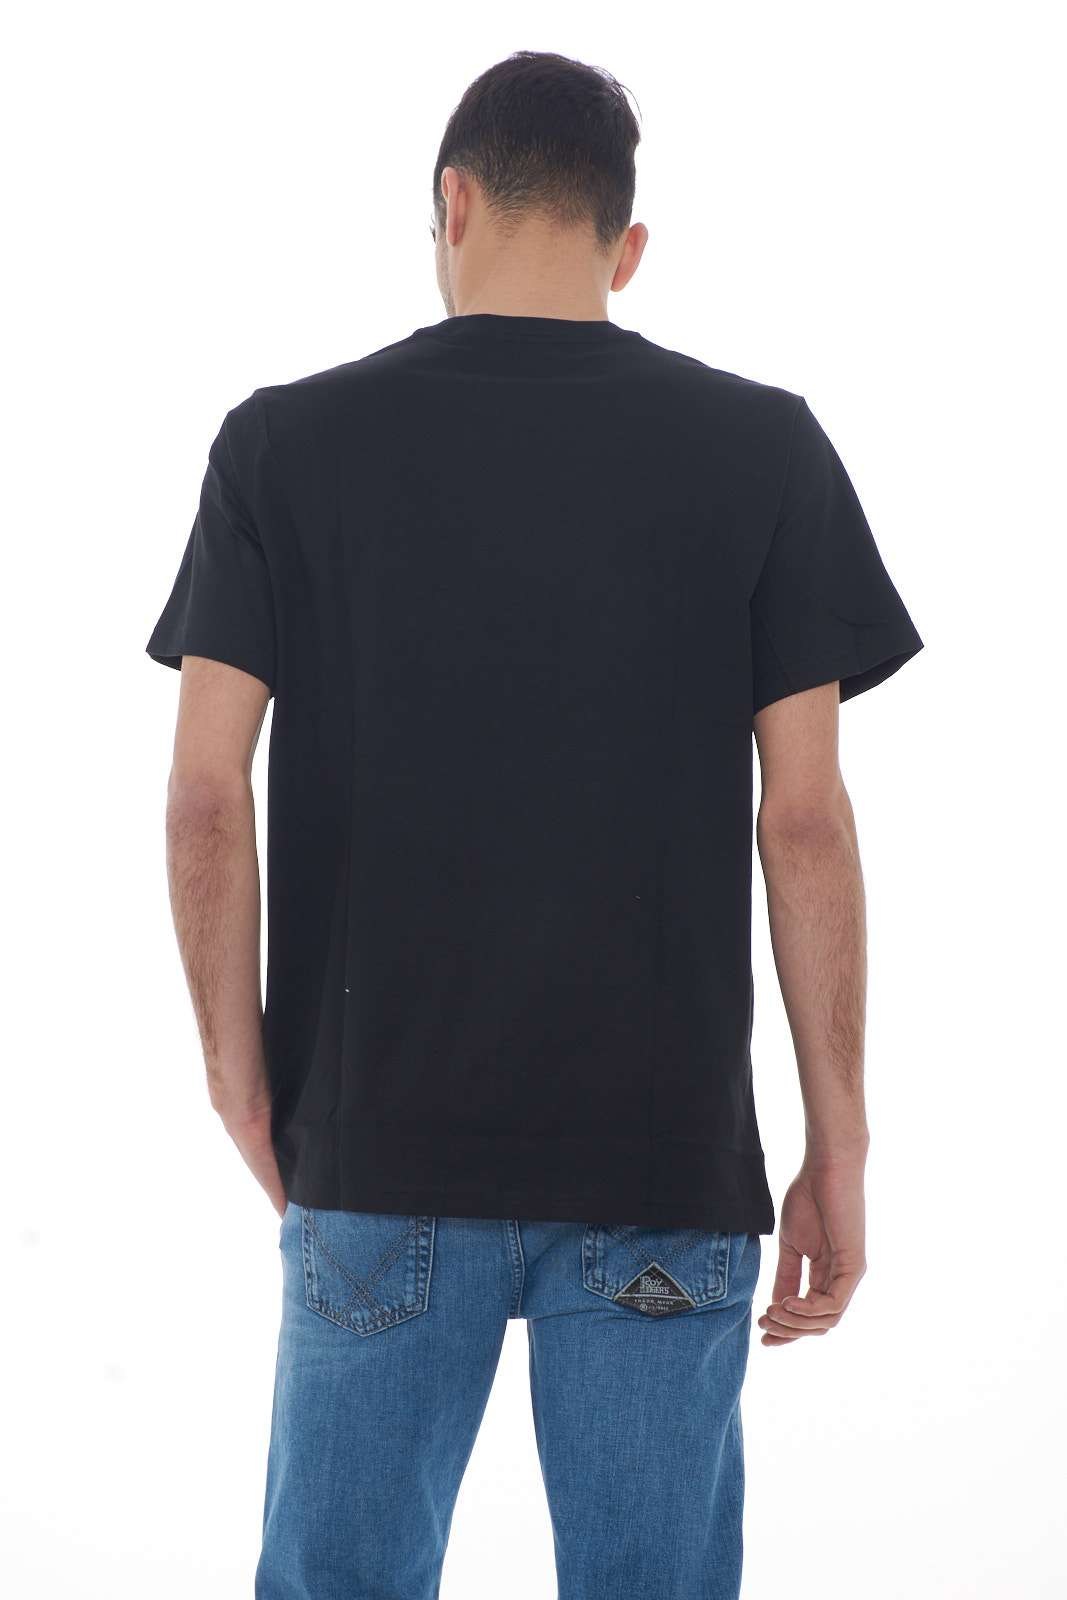 https://www.parmax.com/media/catalog/product/a/i/PE-outlet_parmax-t-shirt-uomo-Levis-699780044-C.jpg